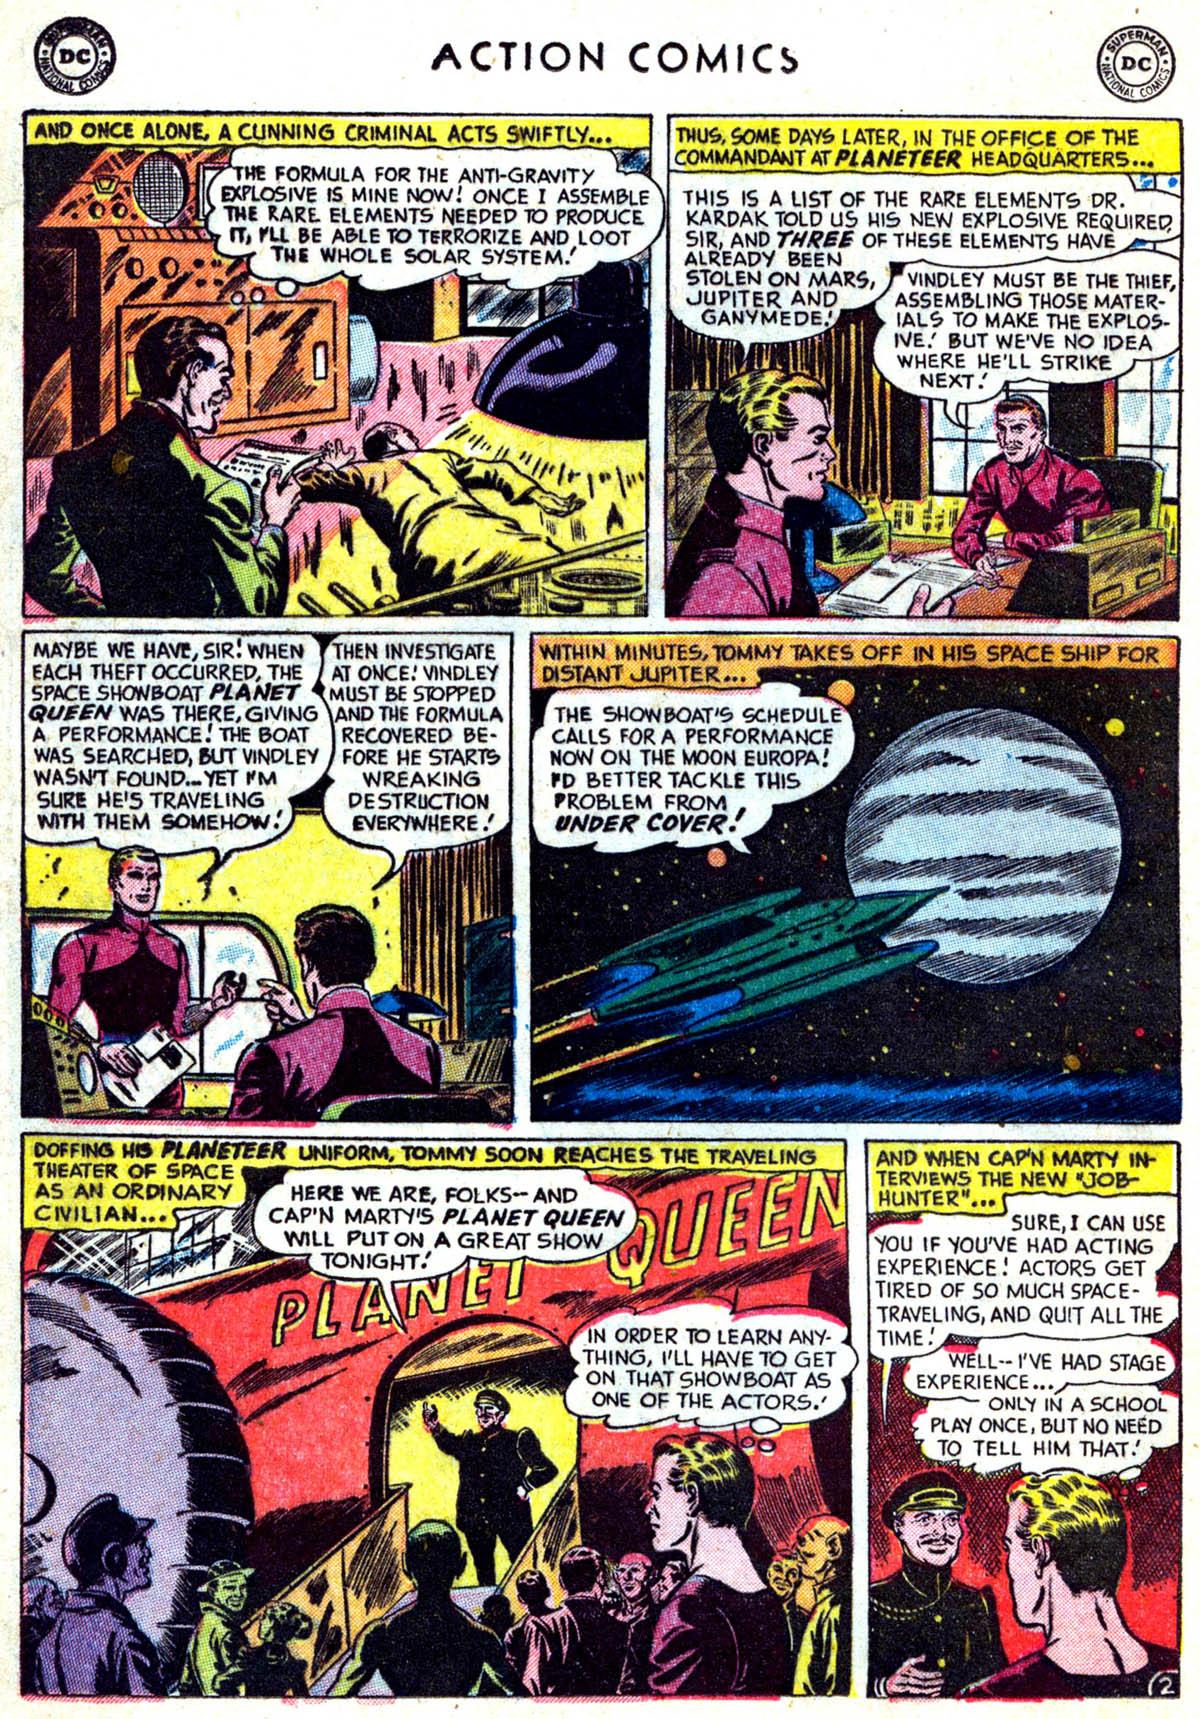 Action Comics (1938) 183 Page 25